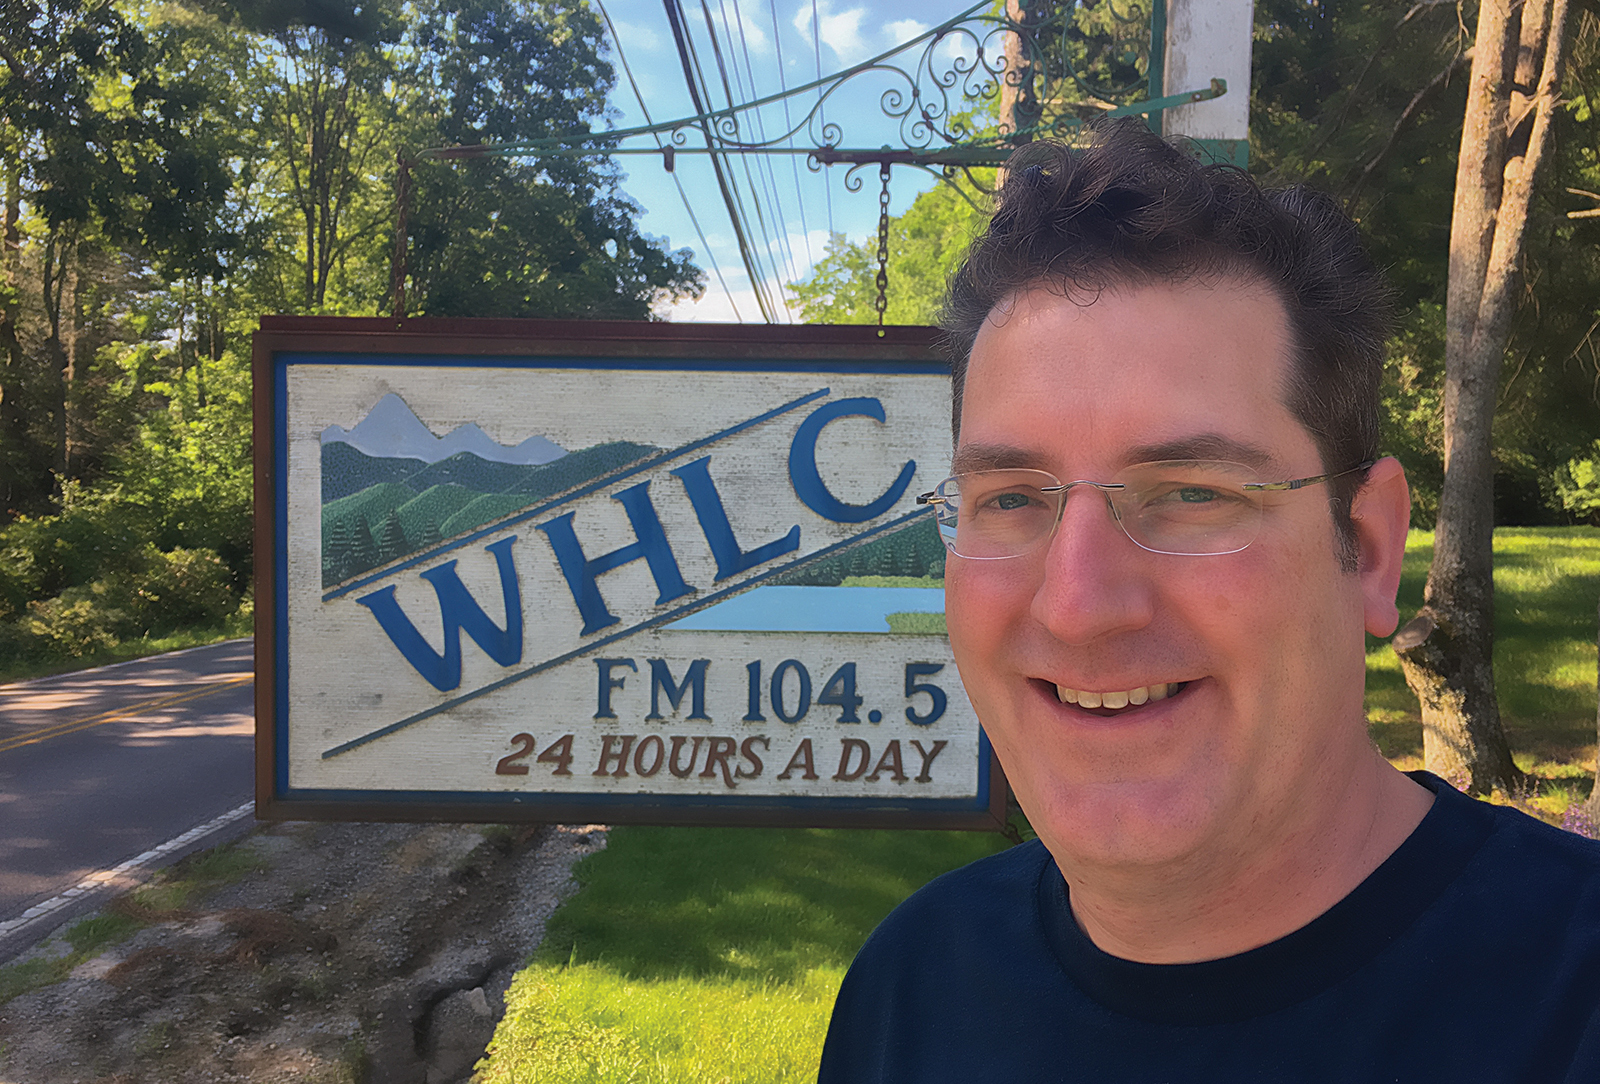 Duffy-WHLC-highlands-nc